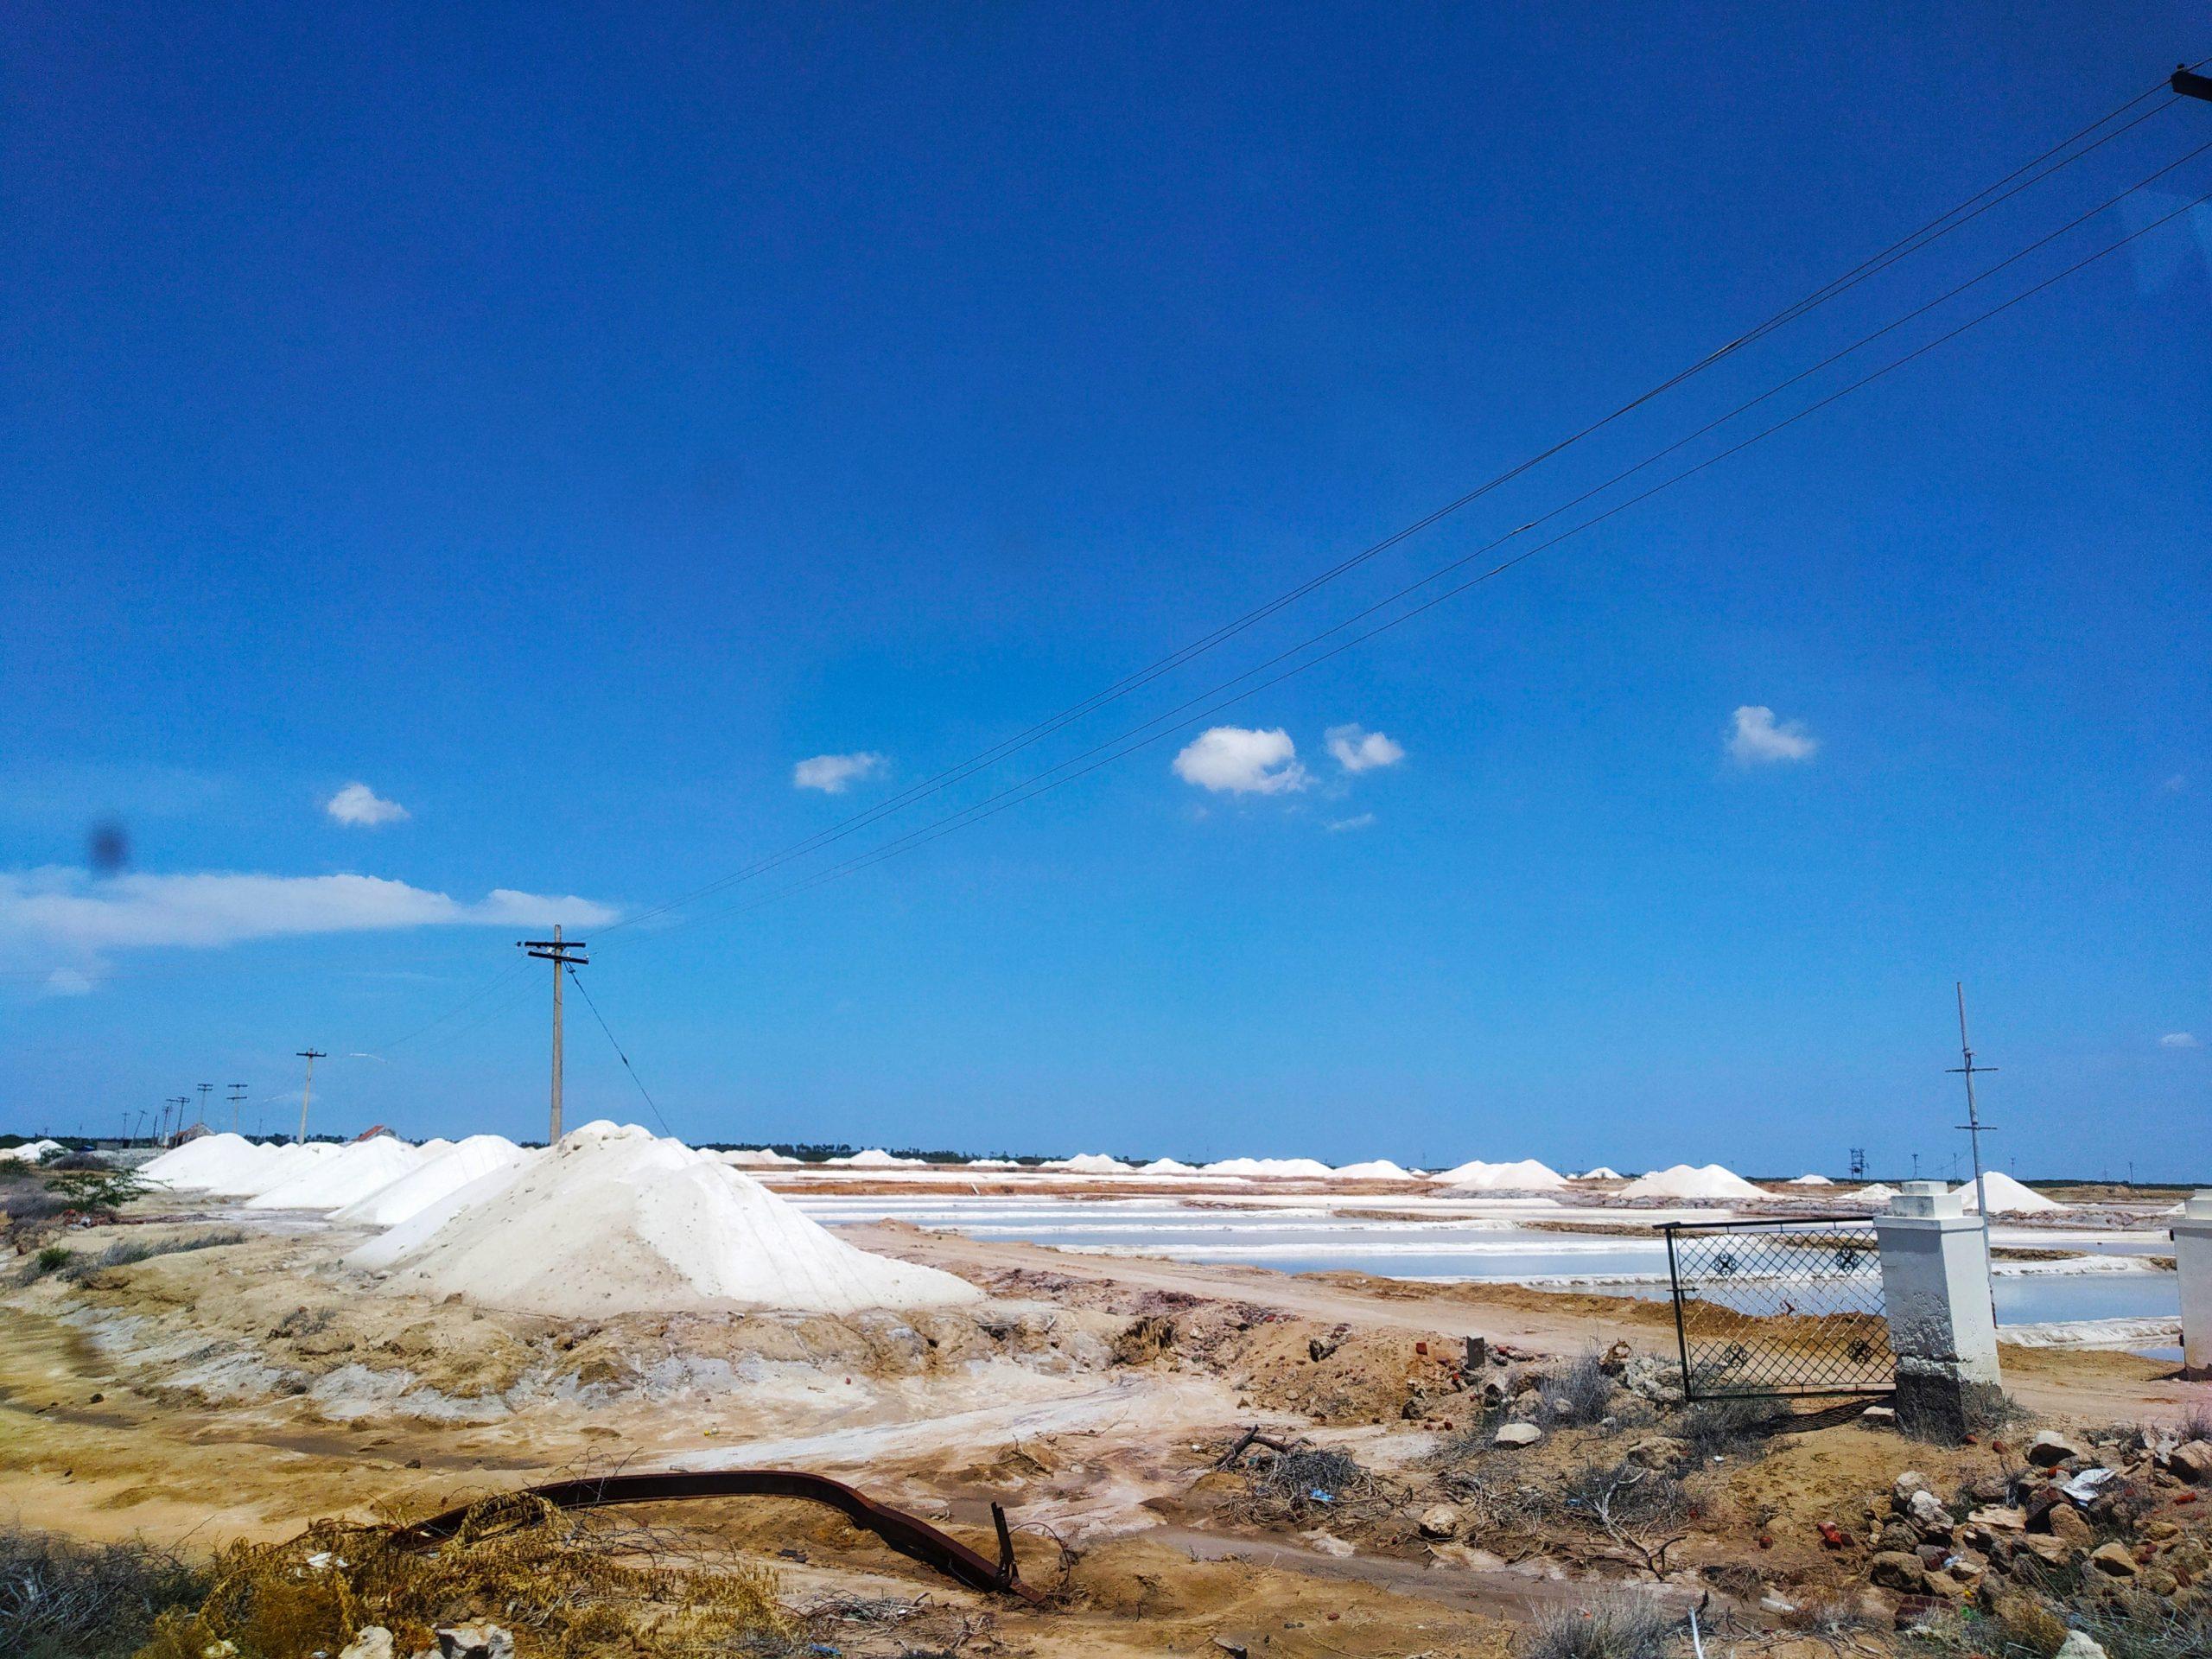 Solar Salt evaporation pond